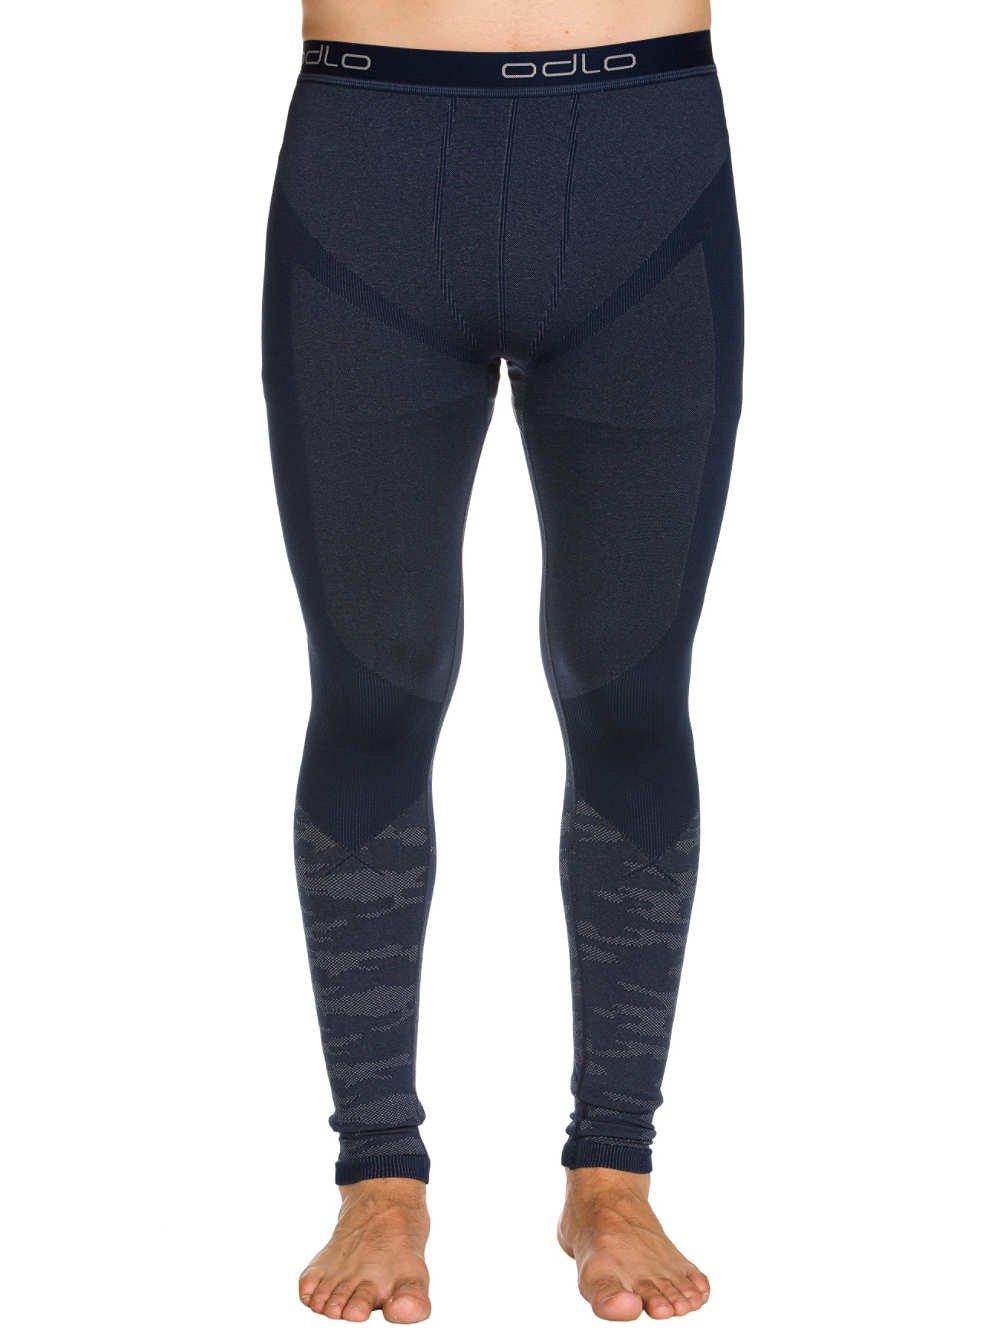 Odlo Warm Trend Men's Thermal Leggings